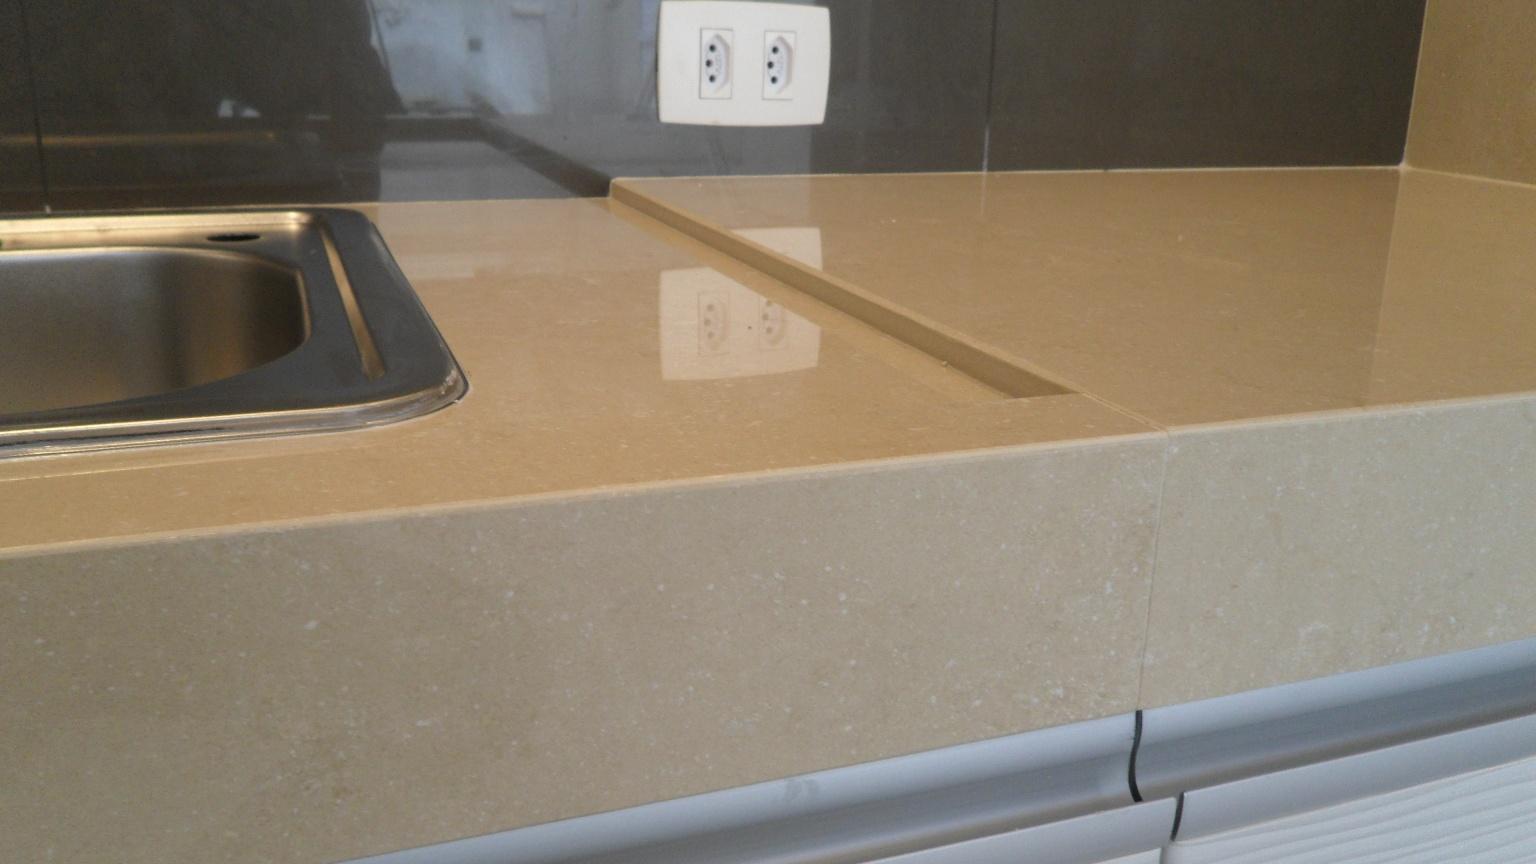 .: Tampo churrasqueira em porcelanato Krema Marfil Portobello #856B46 1536x864 Bancada Banheiro Crema Marfil